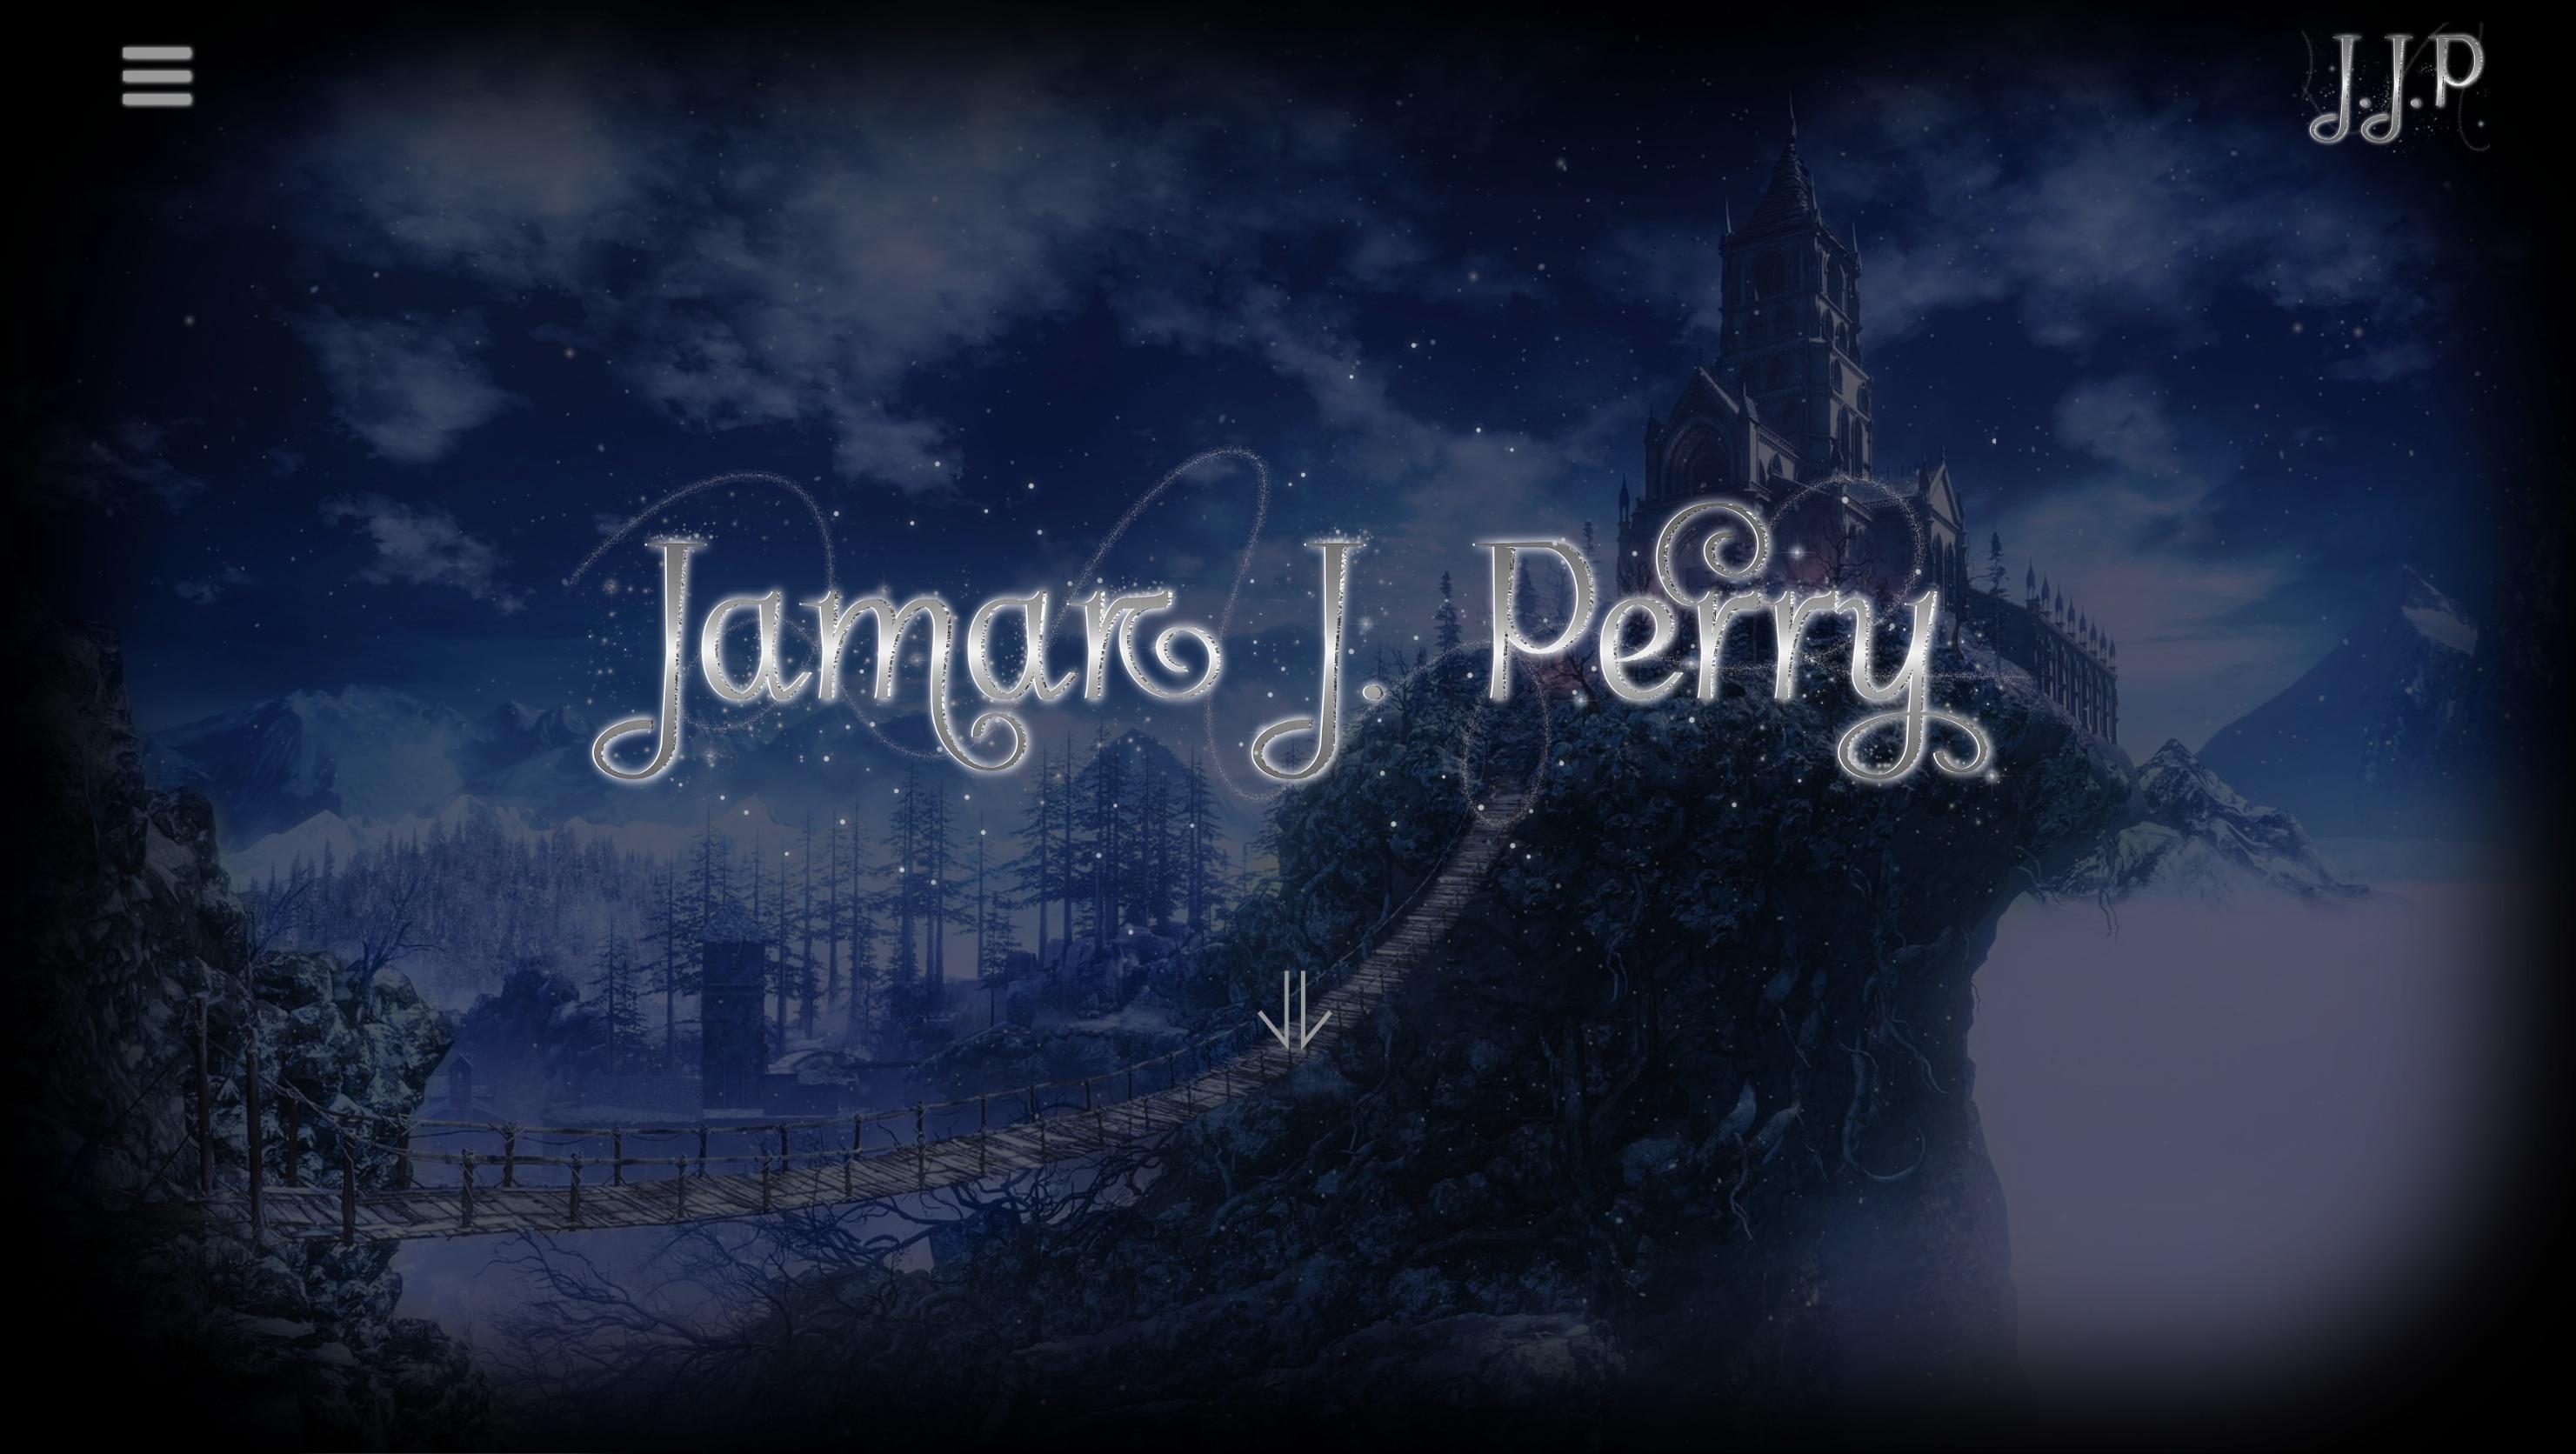 Jamar J. Perry